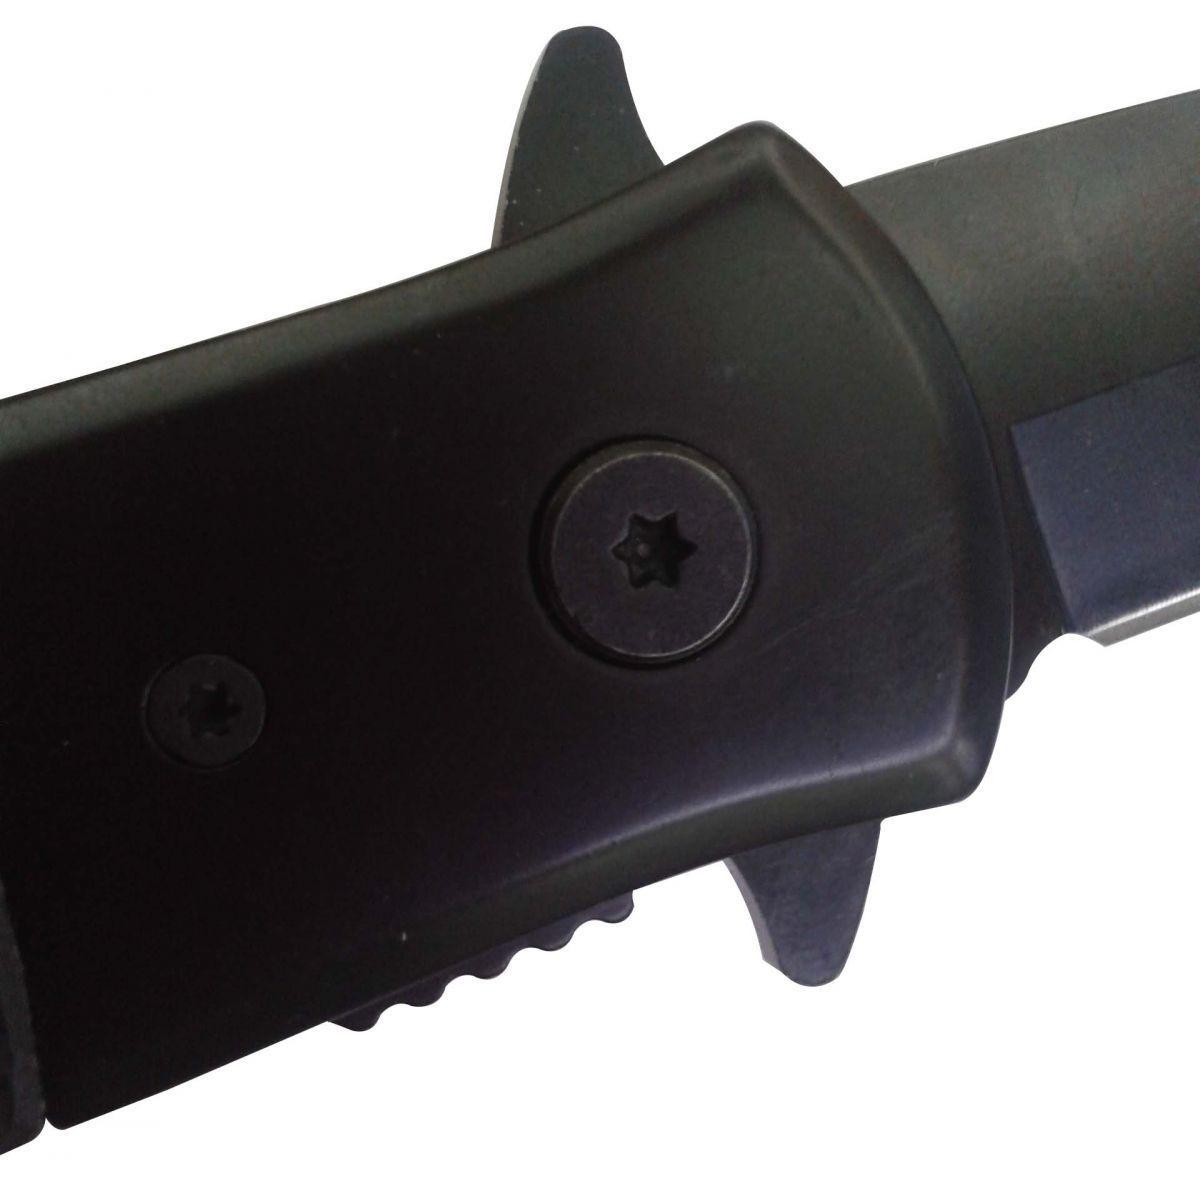 Canivete Estilleto - Frete Grátis  - Thata Esportes